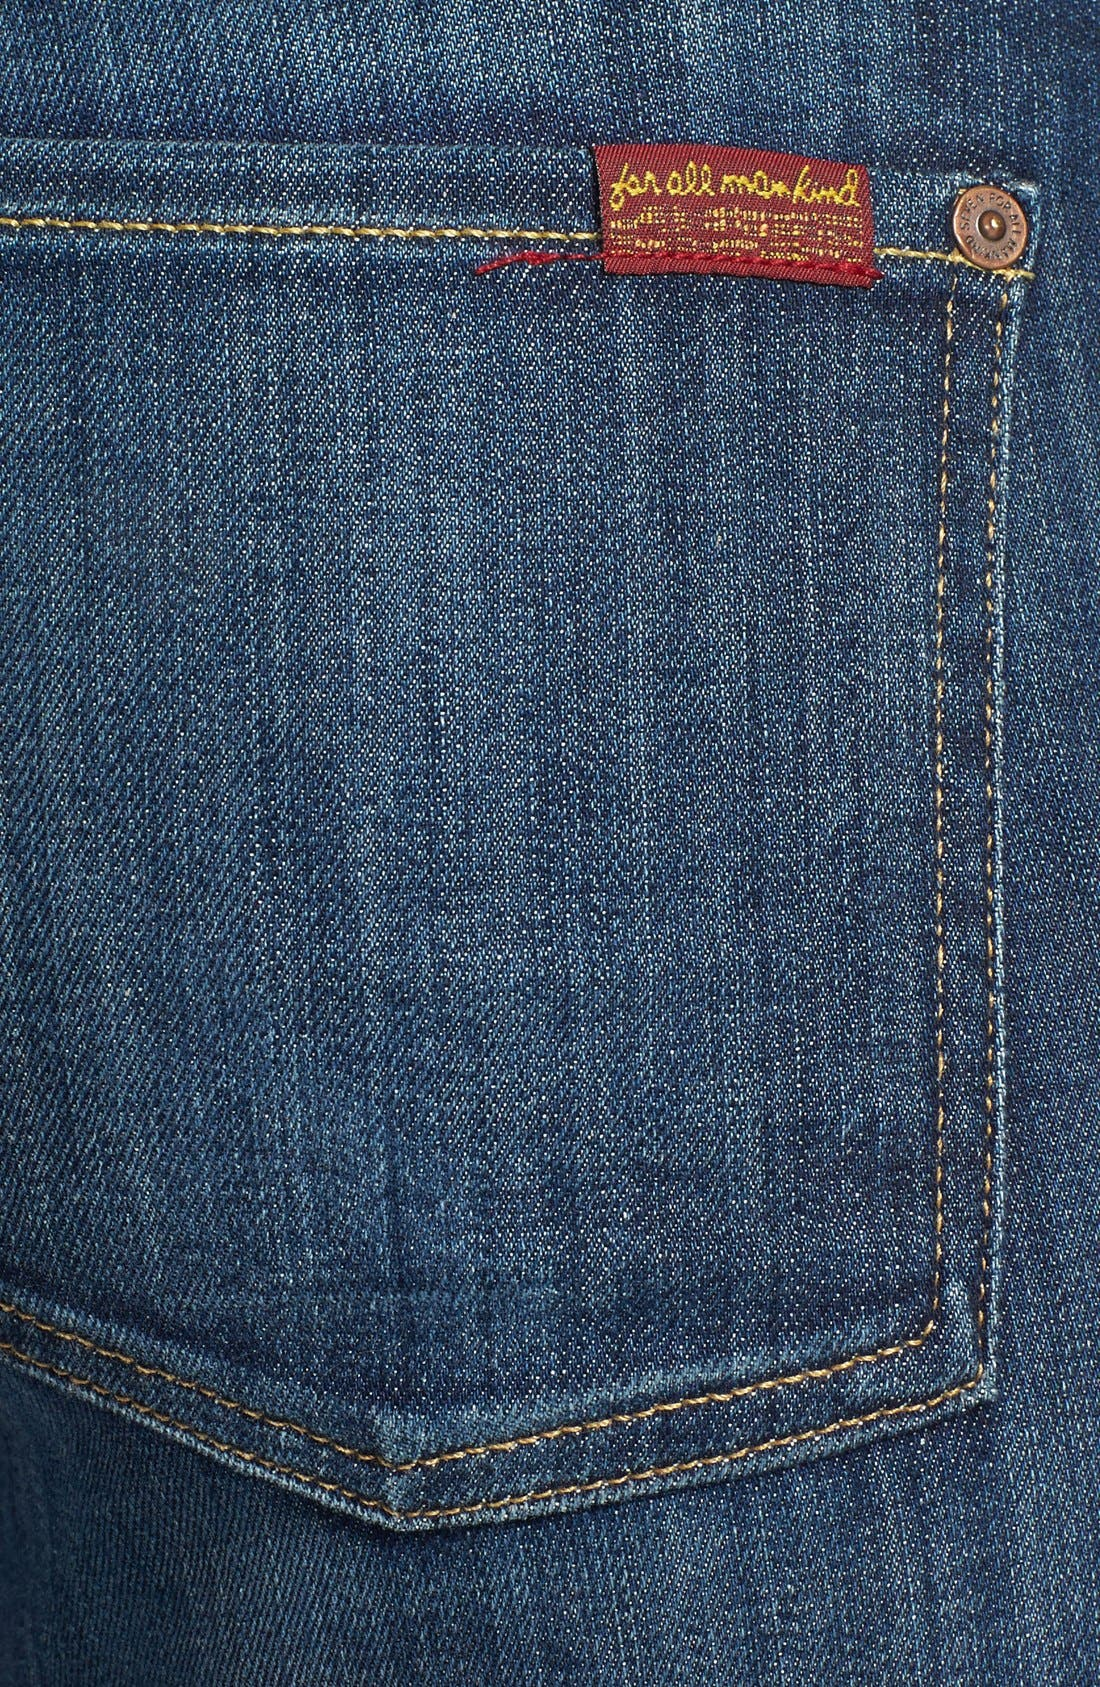 Alternate Image 3  - 7 For All Mankind® Crop Skinny Jeans (Nouveau New York Dark)